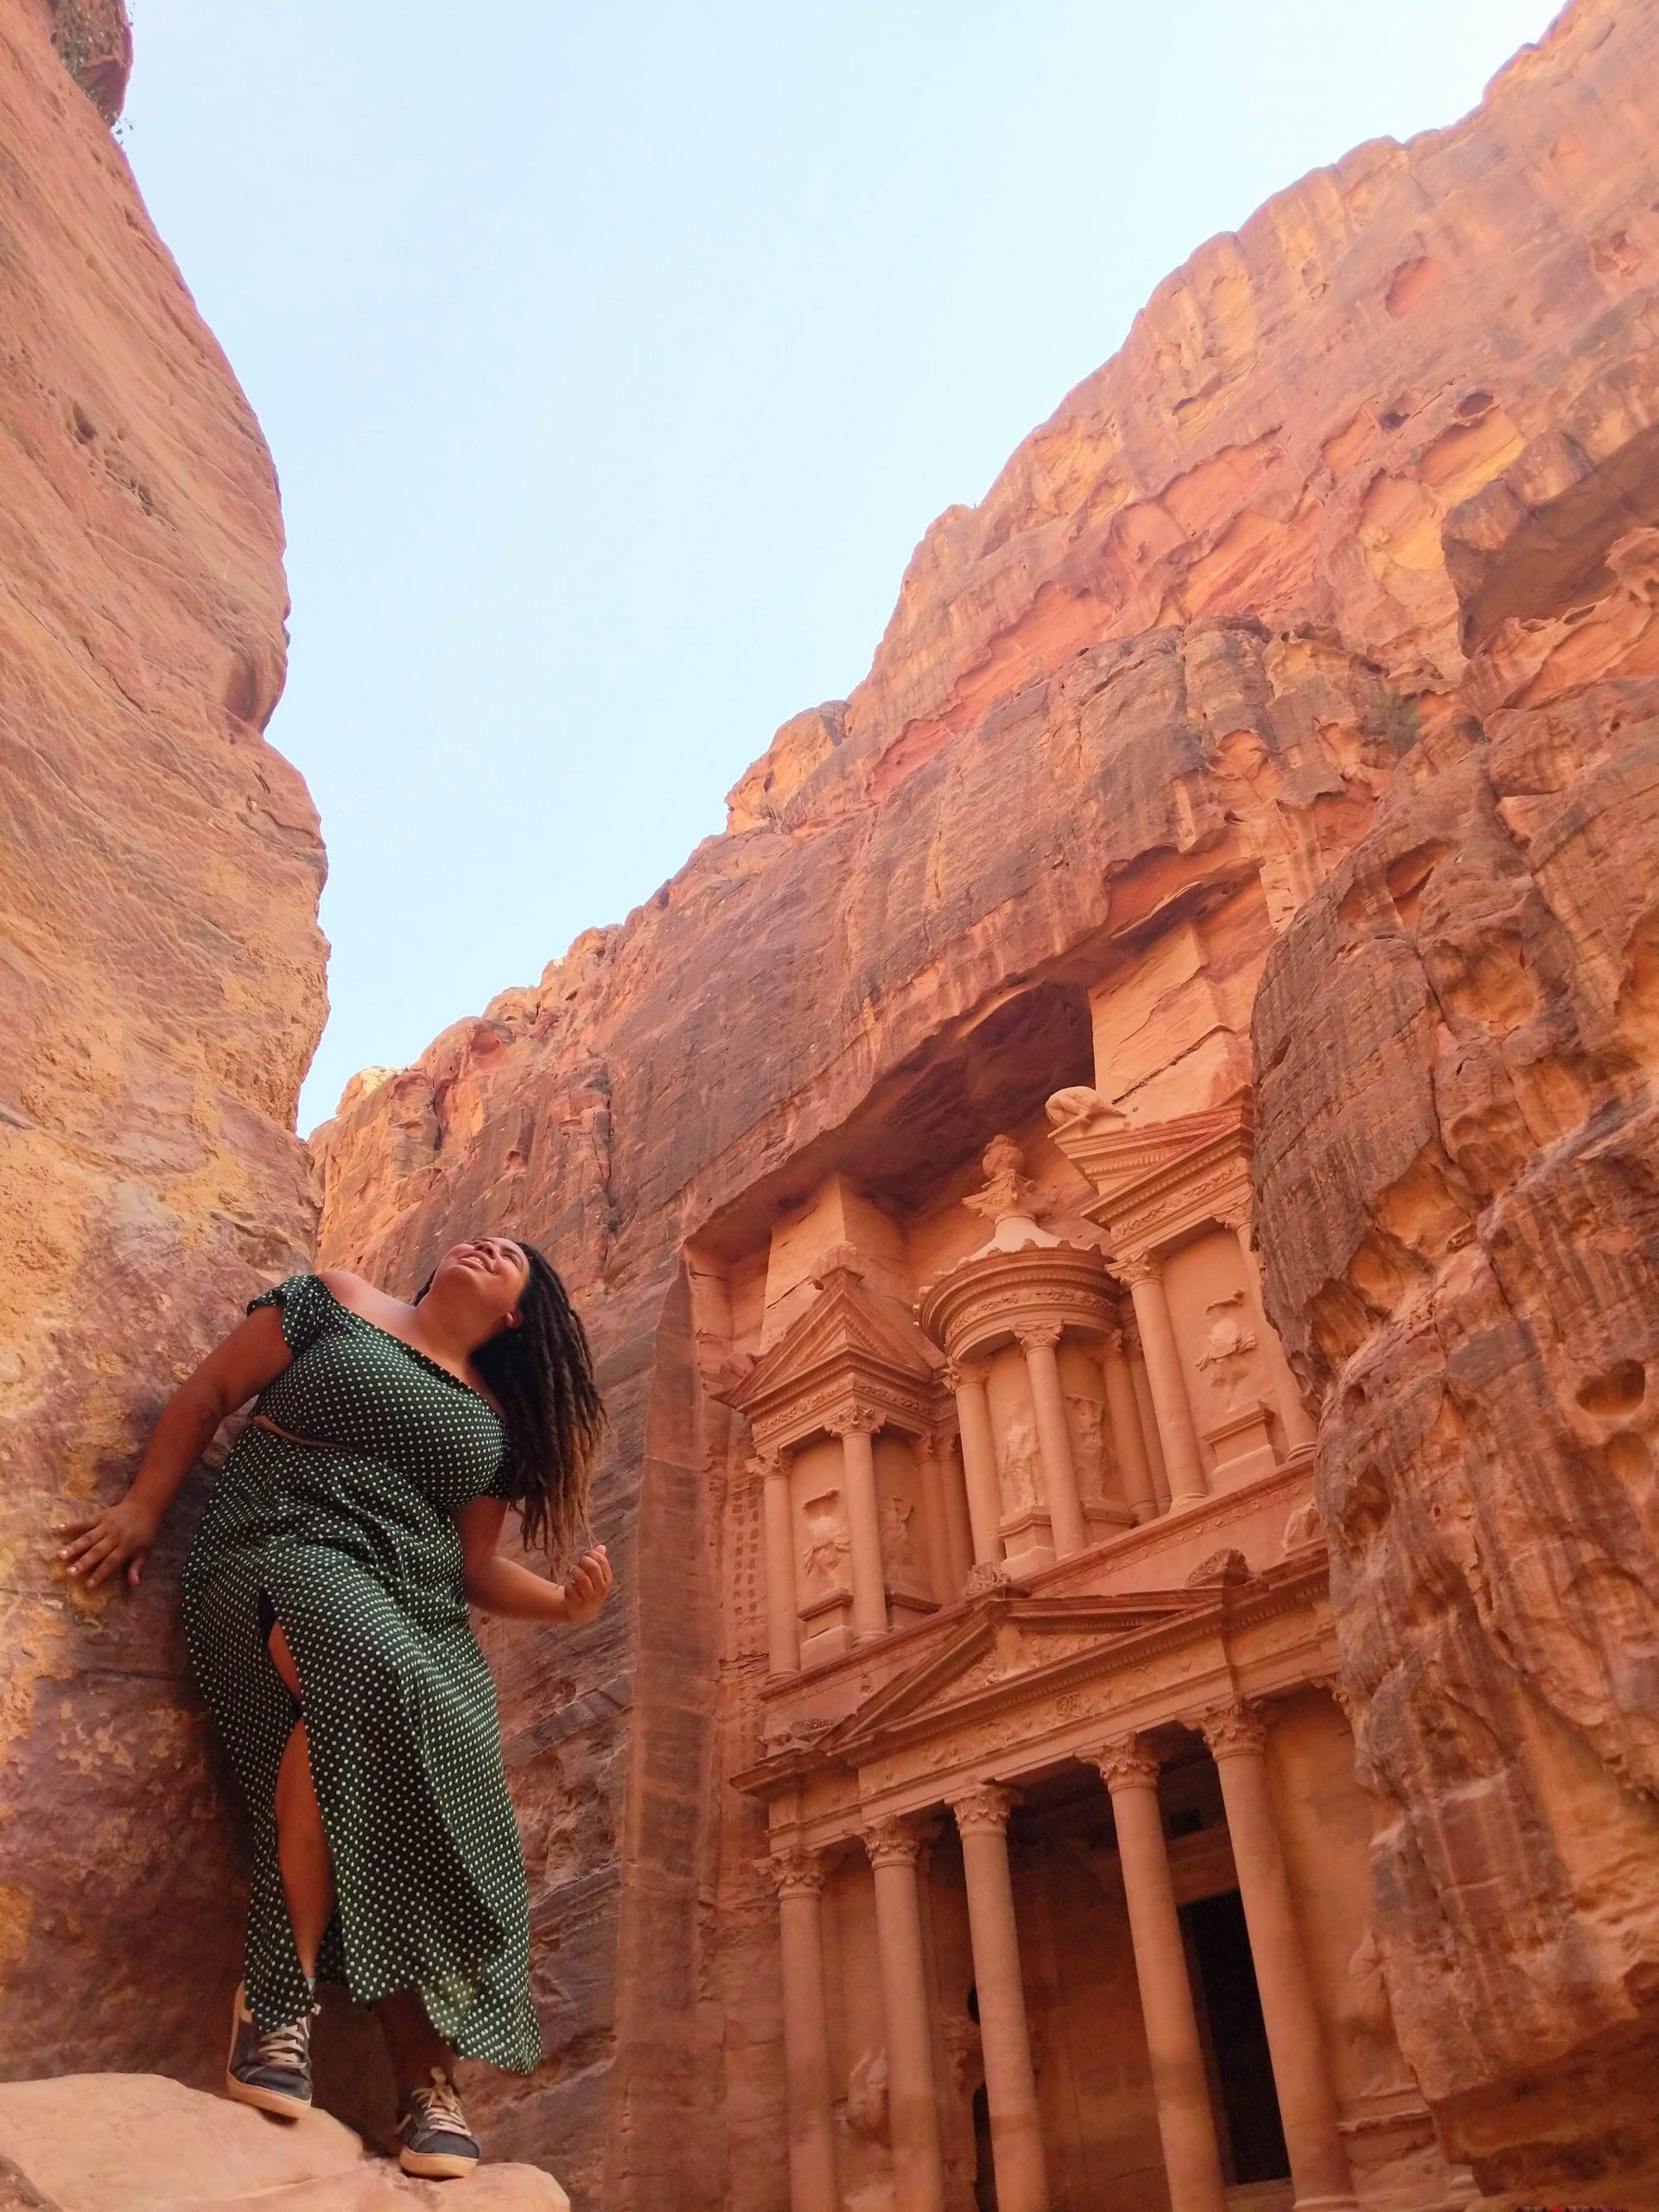 Samantha O'Brochta at The Treasury in Petra, Jordan